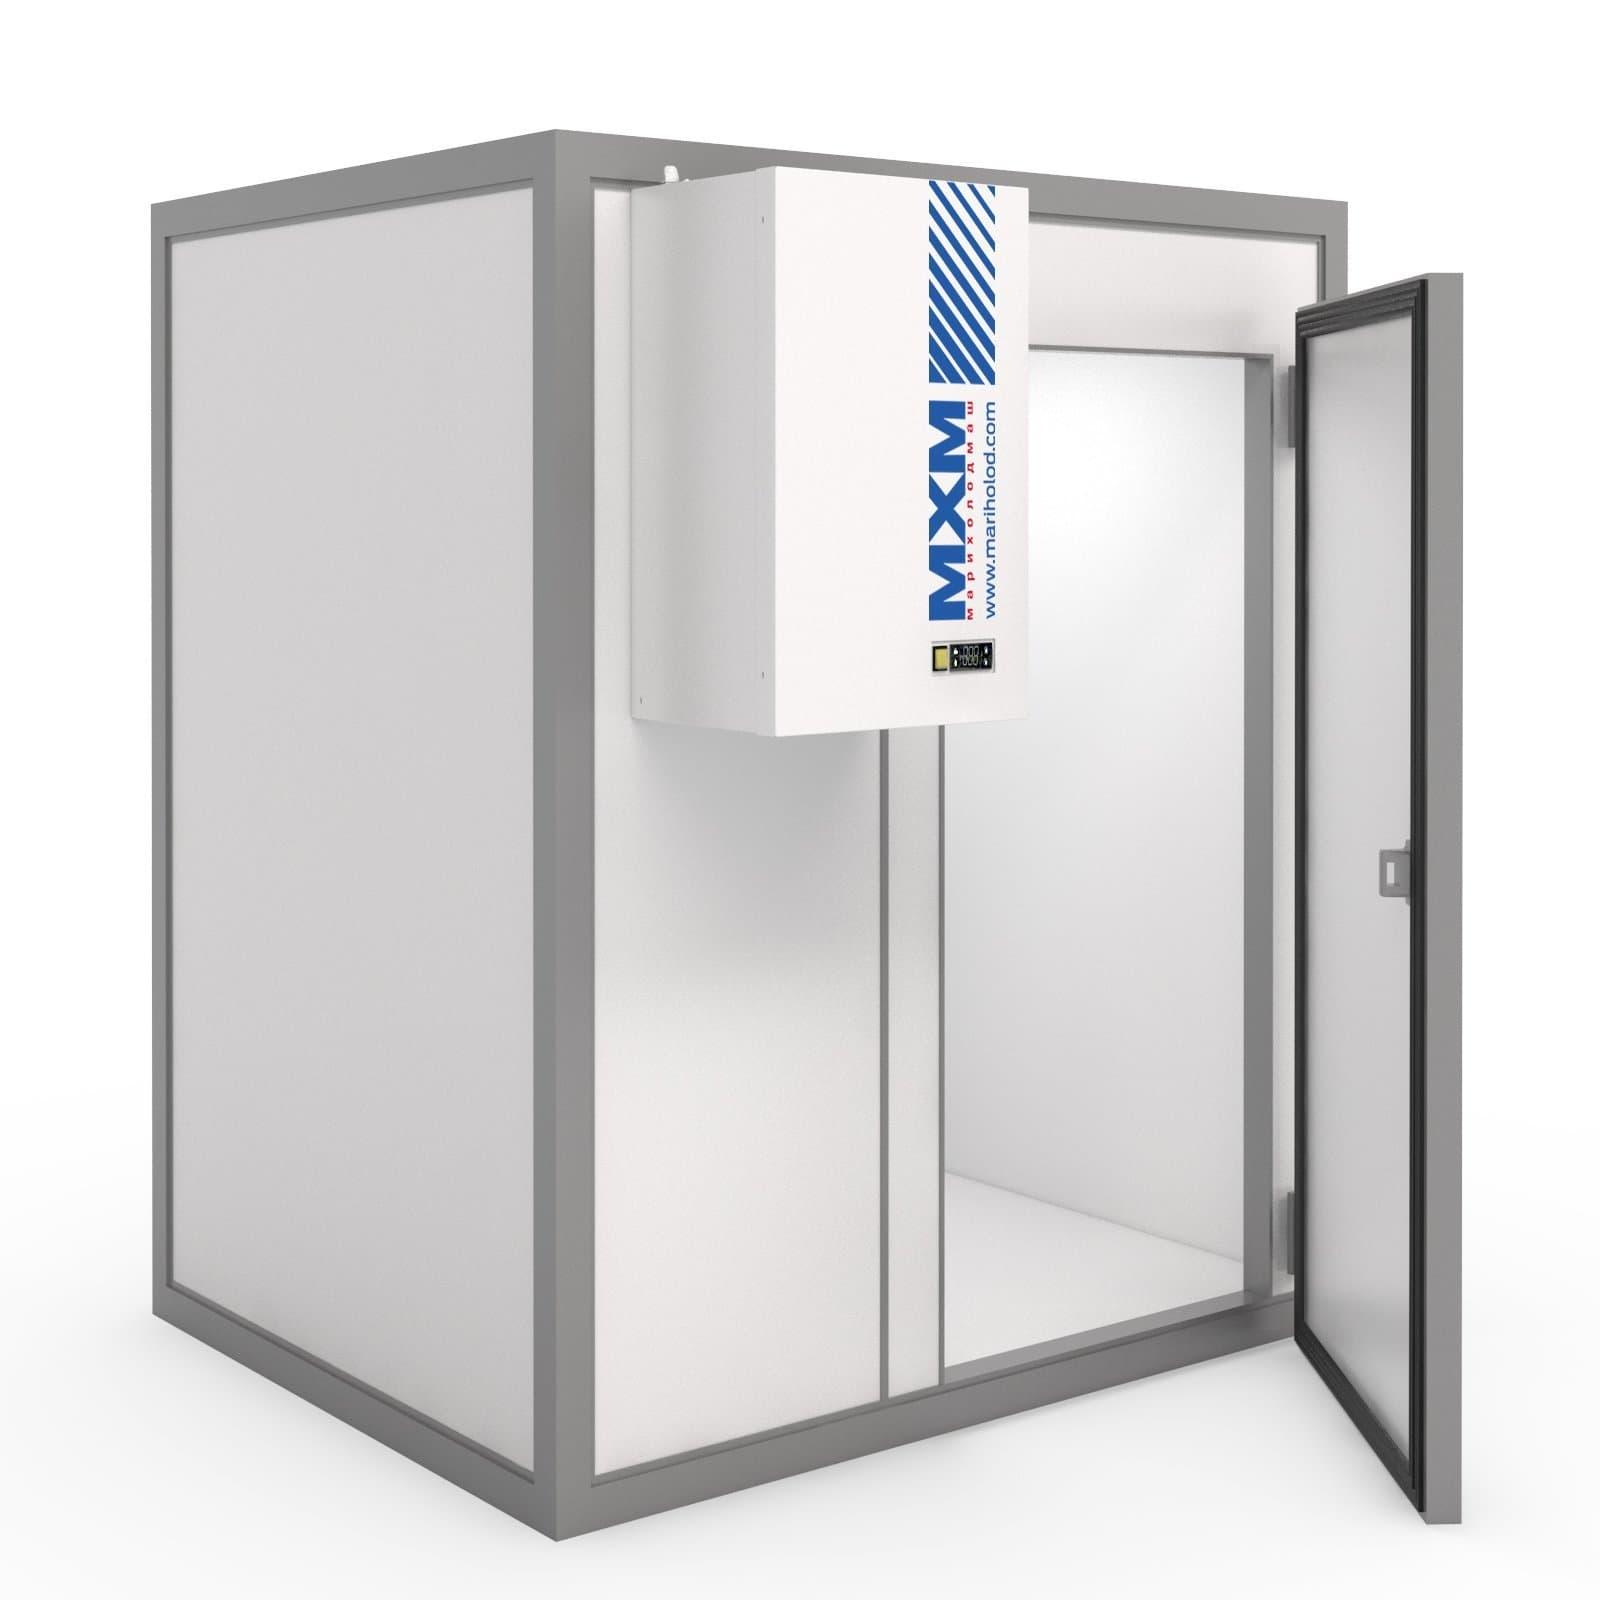 Камера холодильная МХМ КХН-21,53 1360×7960×2460